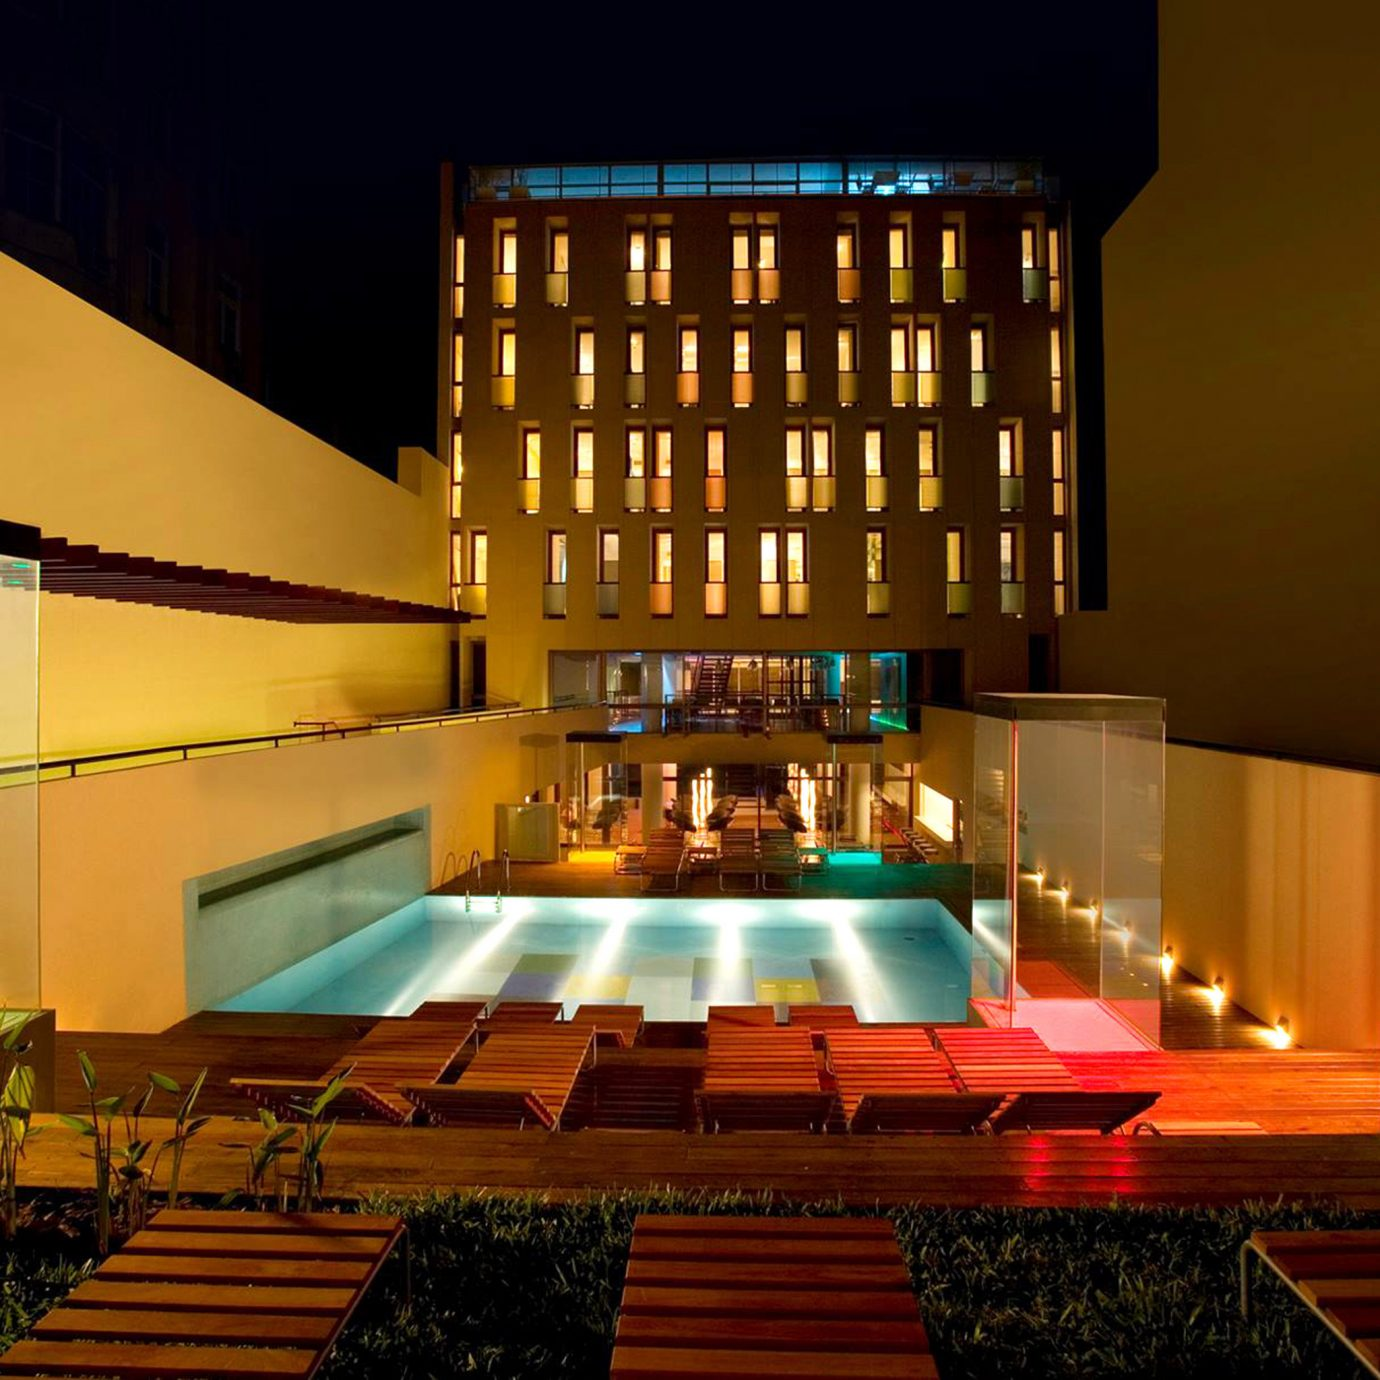 City Lounge Luxury Pool Lobby auditorium stage lighting light night